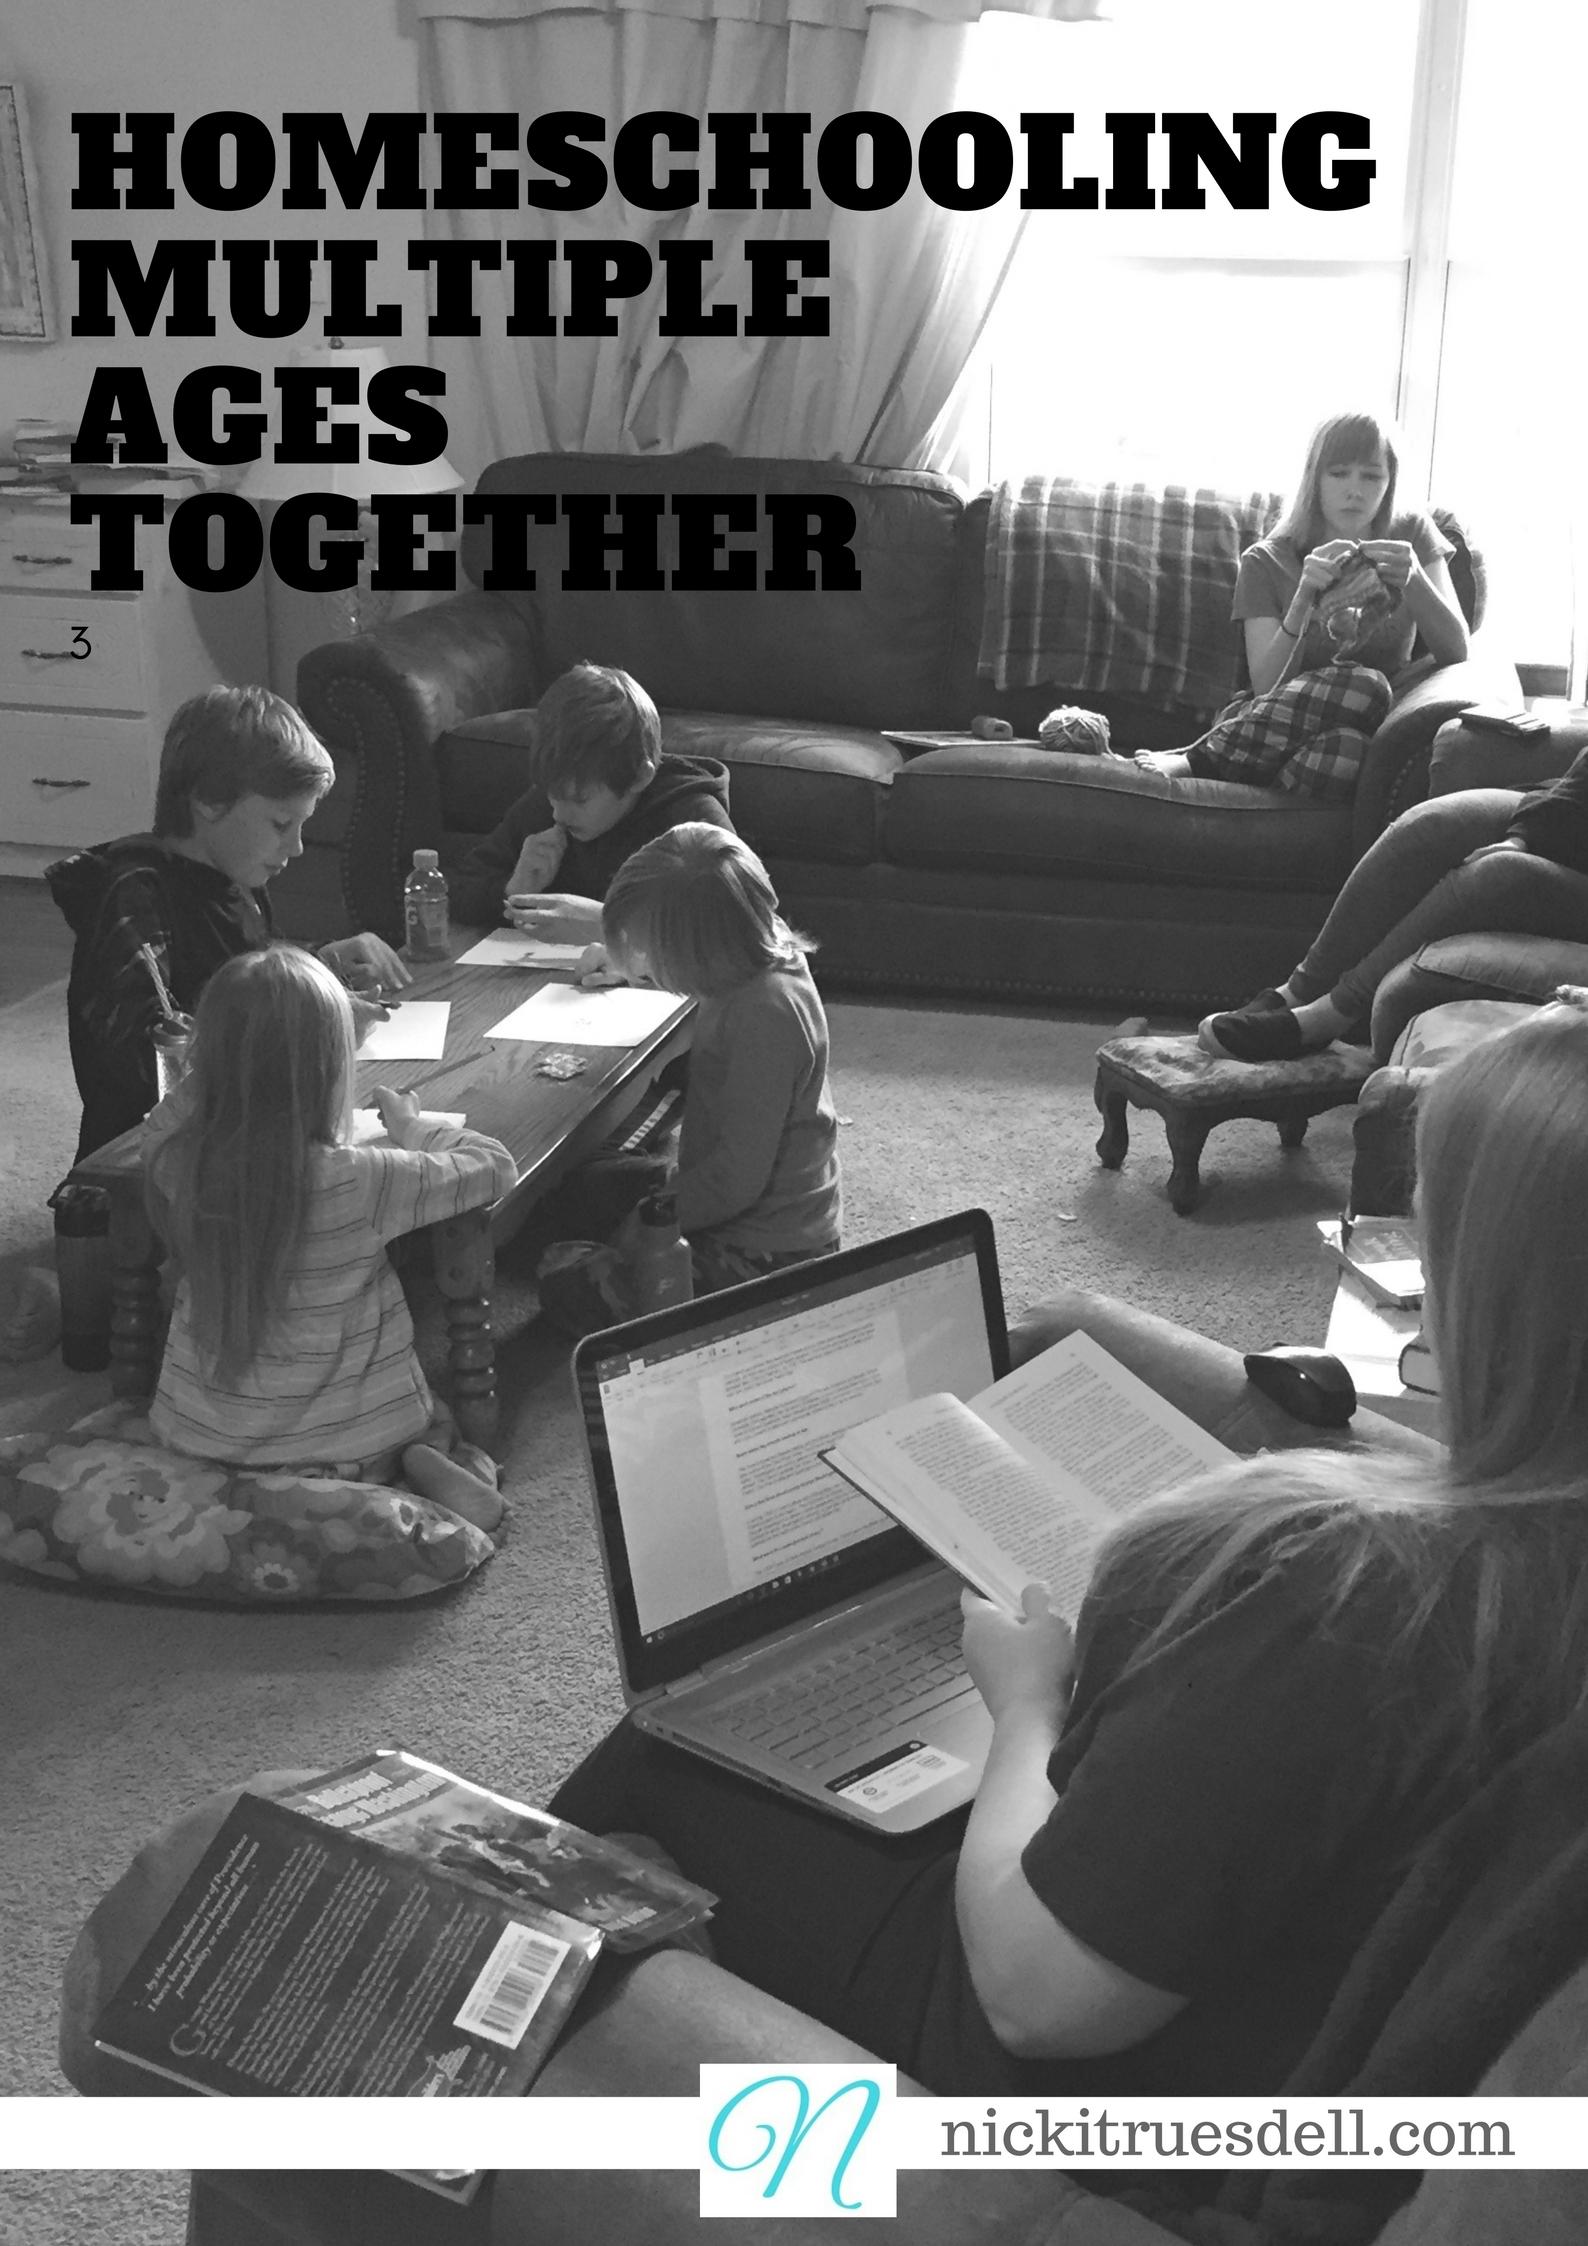 homeschooling multiple ages together